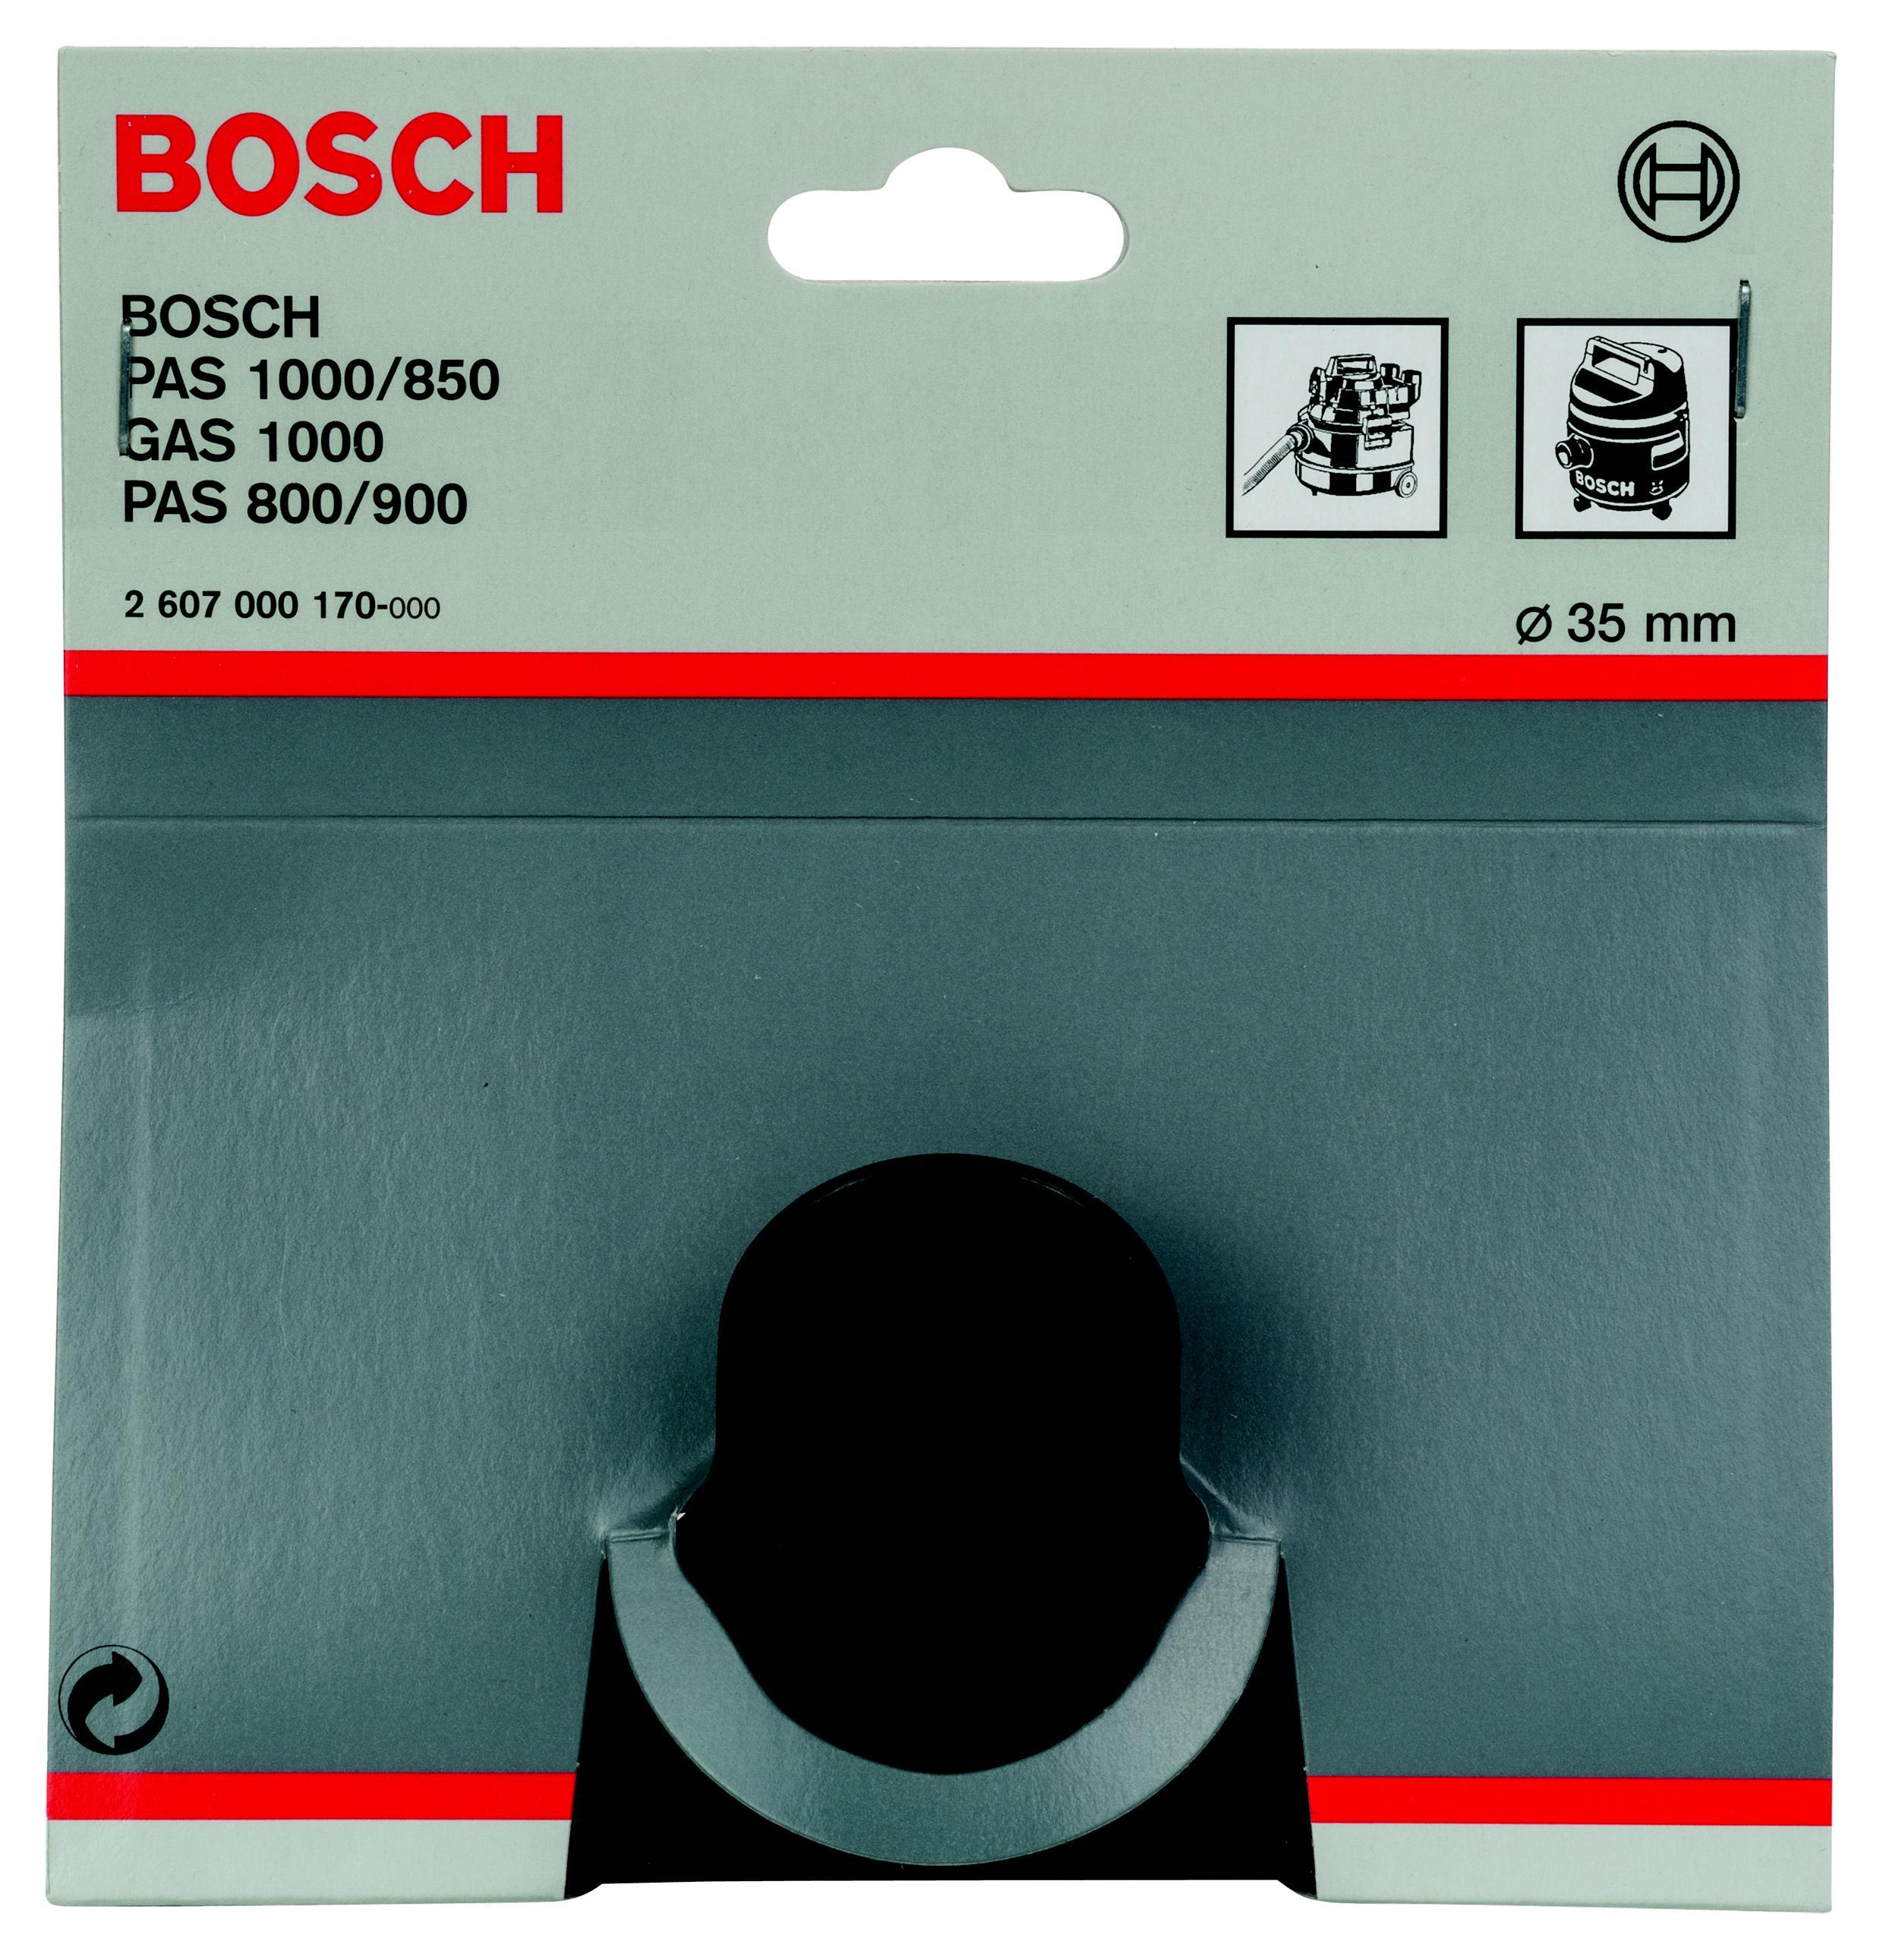 Насадка Bosch 2607000170